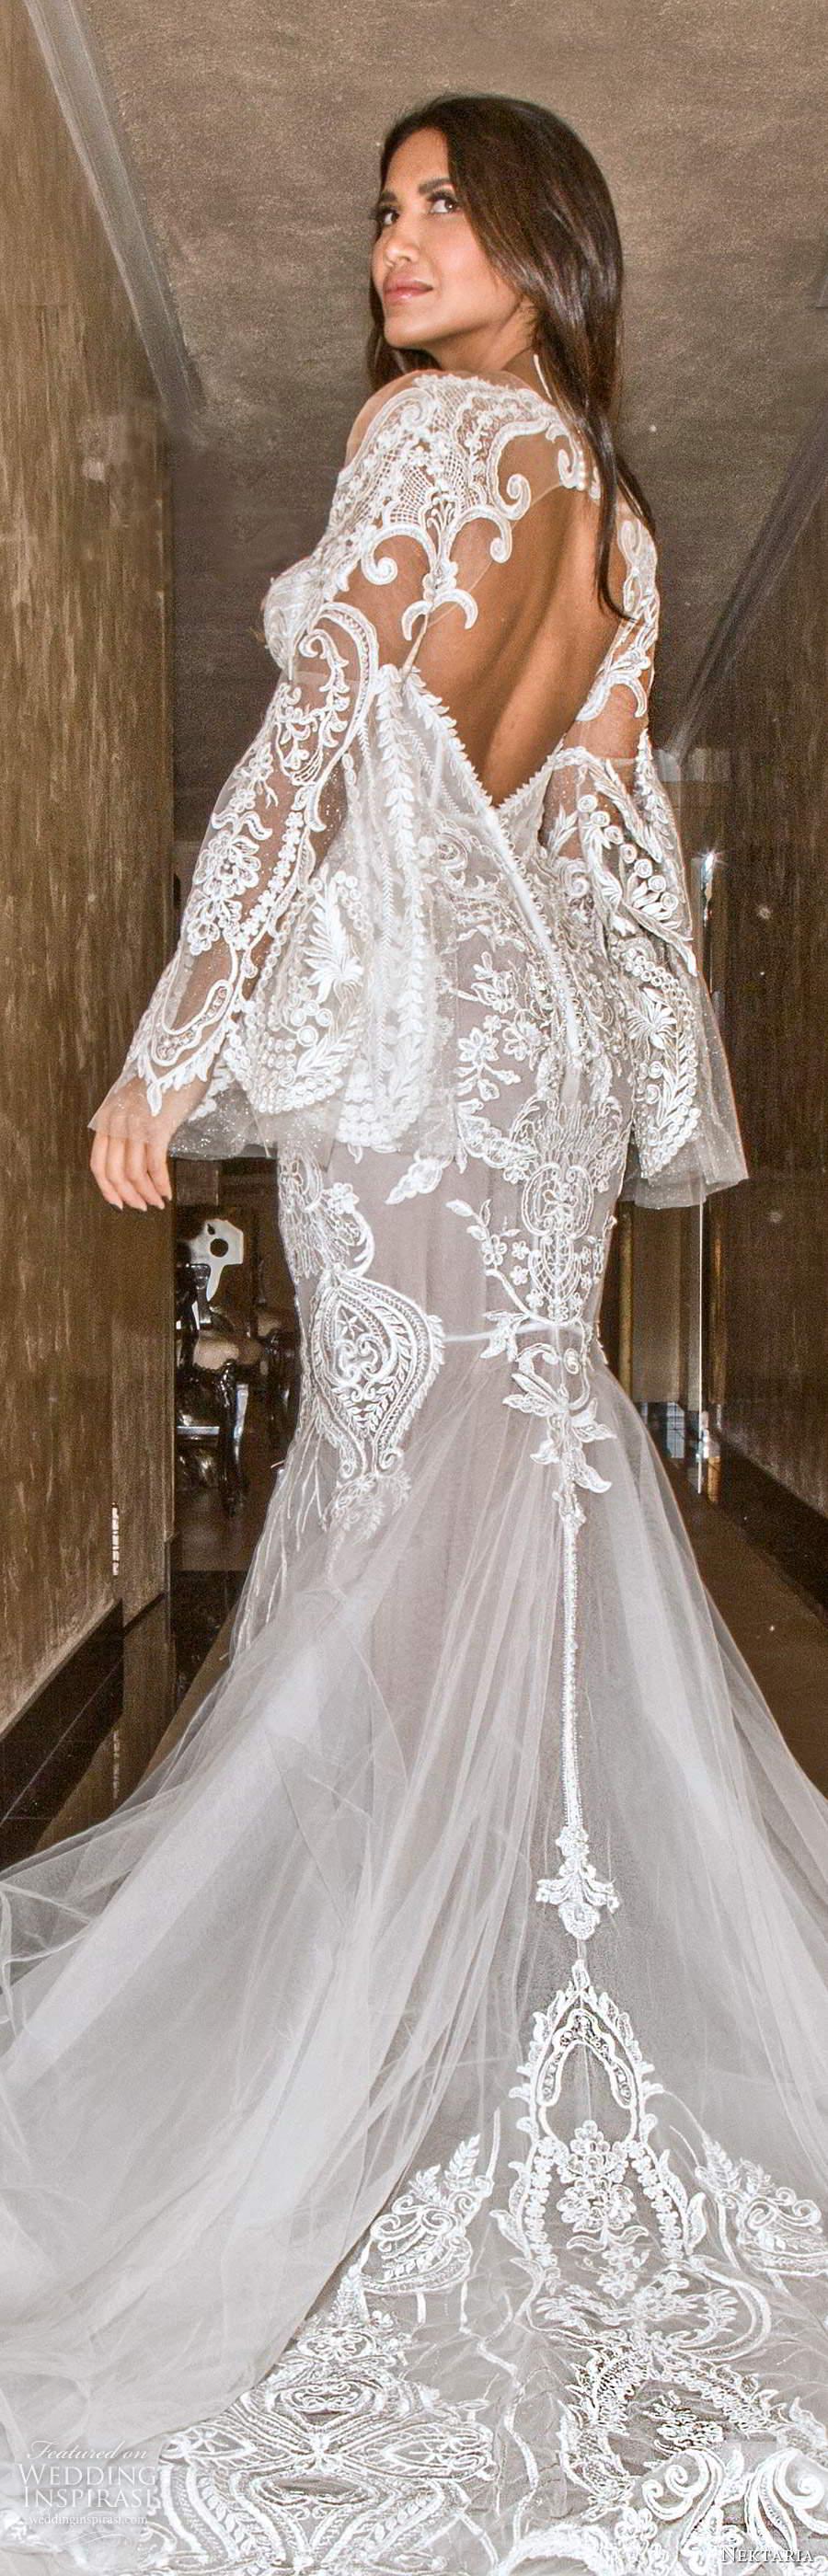 nektaria 2020 bridal long flare sleeves sweetheart neckline fit flare mermaid wedding dress chapel train keyhole back (1) lbv